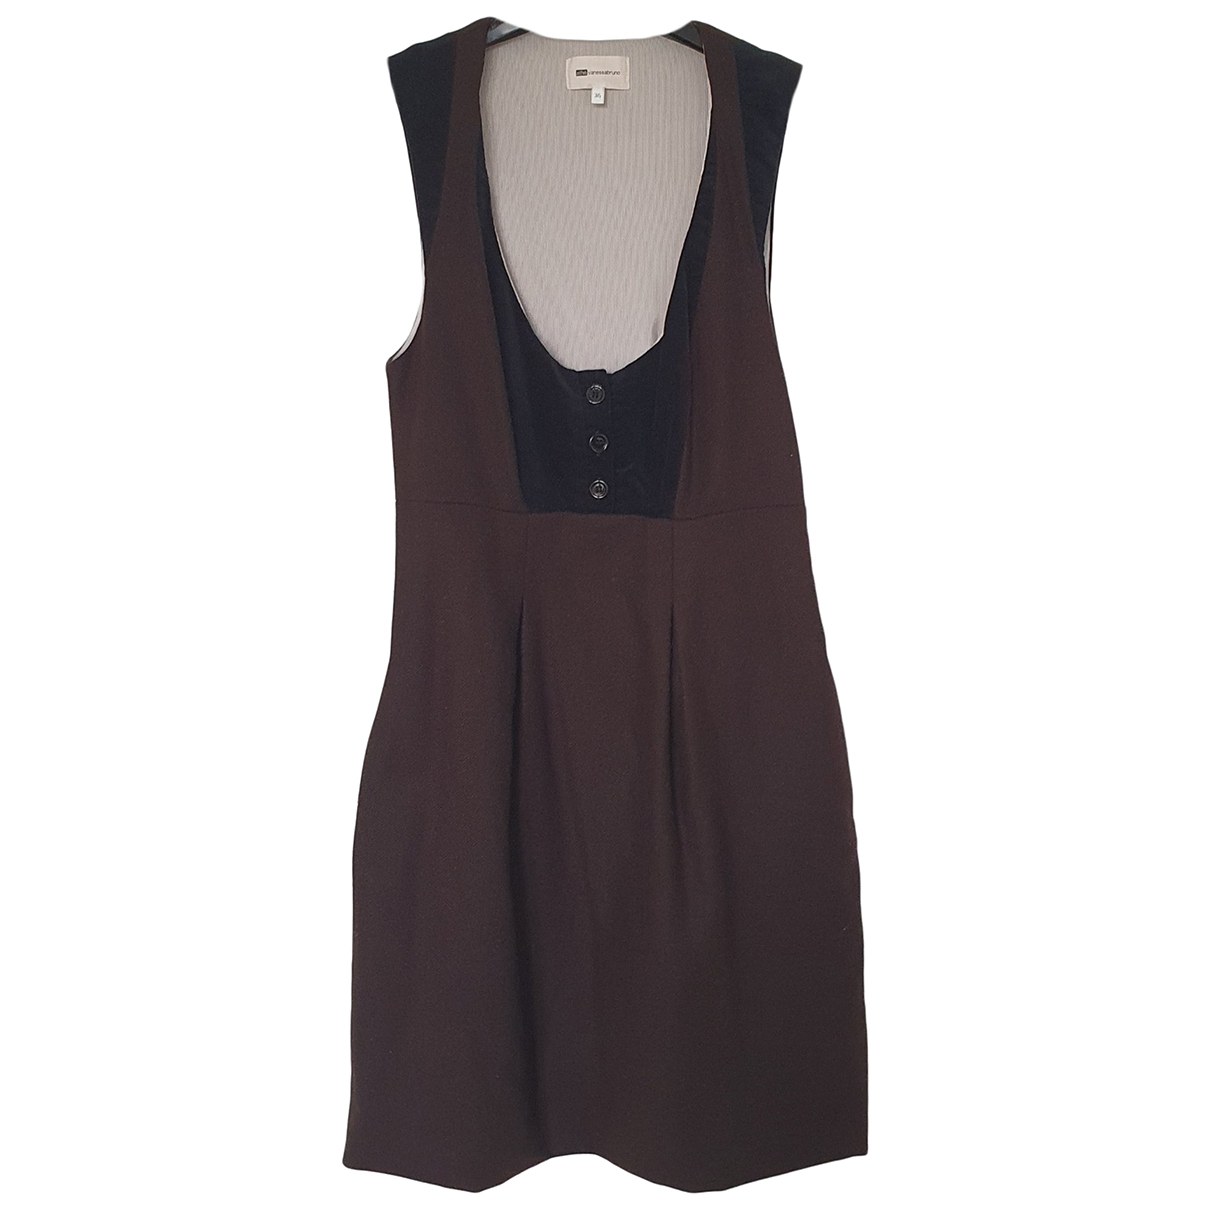 Vanessa Bruno Athe \N Brown Wool dress for Women 36 FR